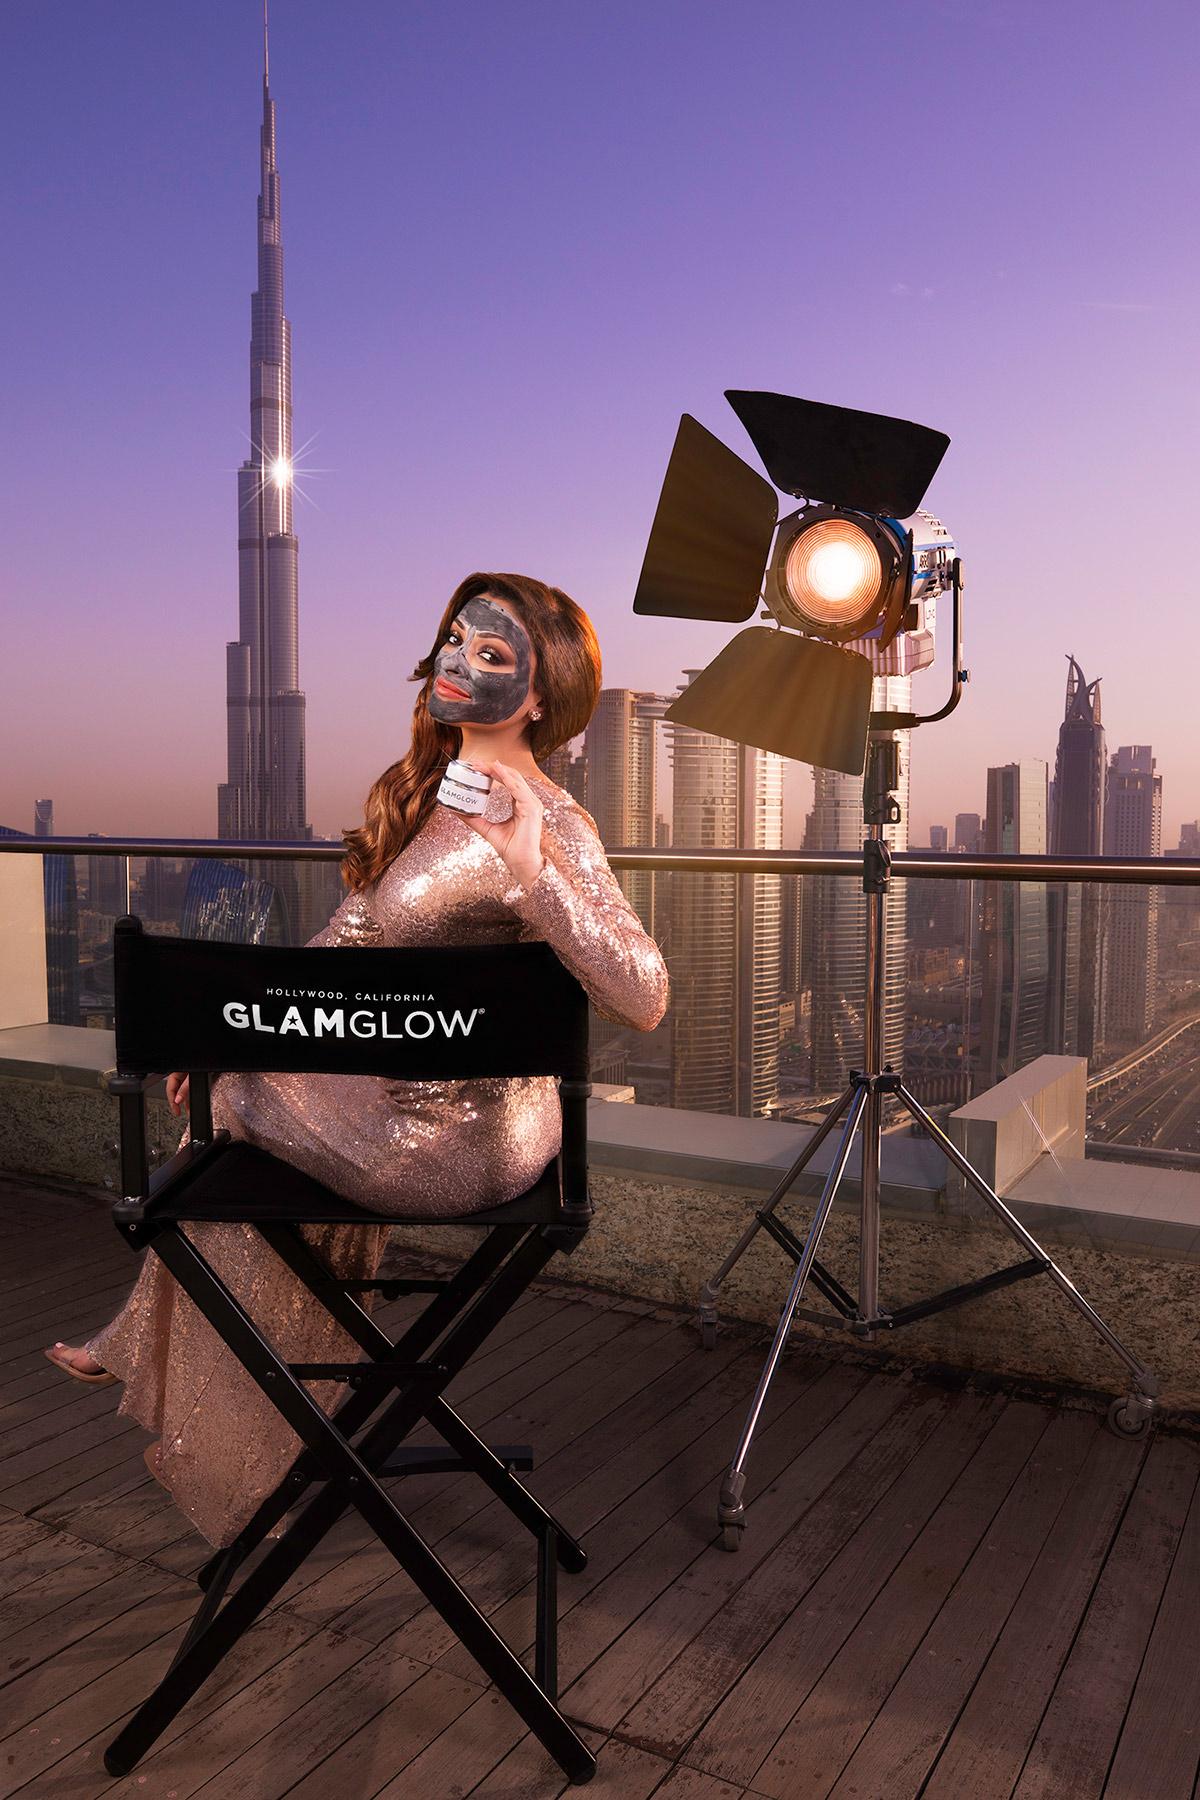 GlamGlow campaign shoot in Dubai for Estee Lauder by Loesje Kessels